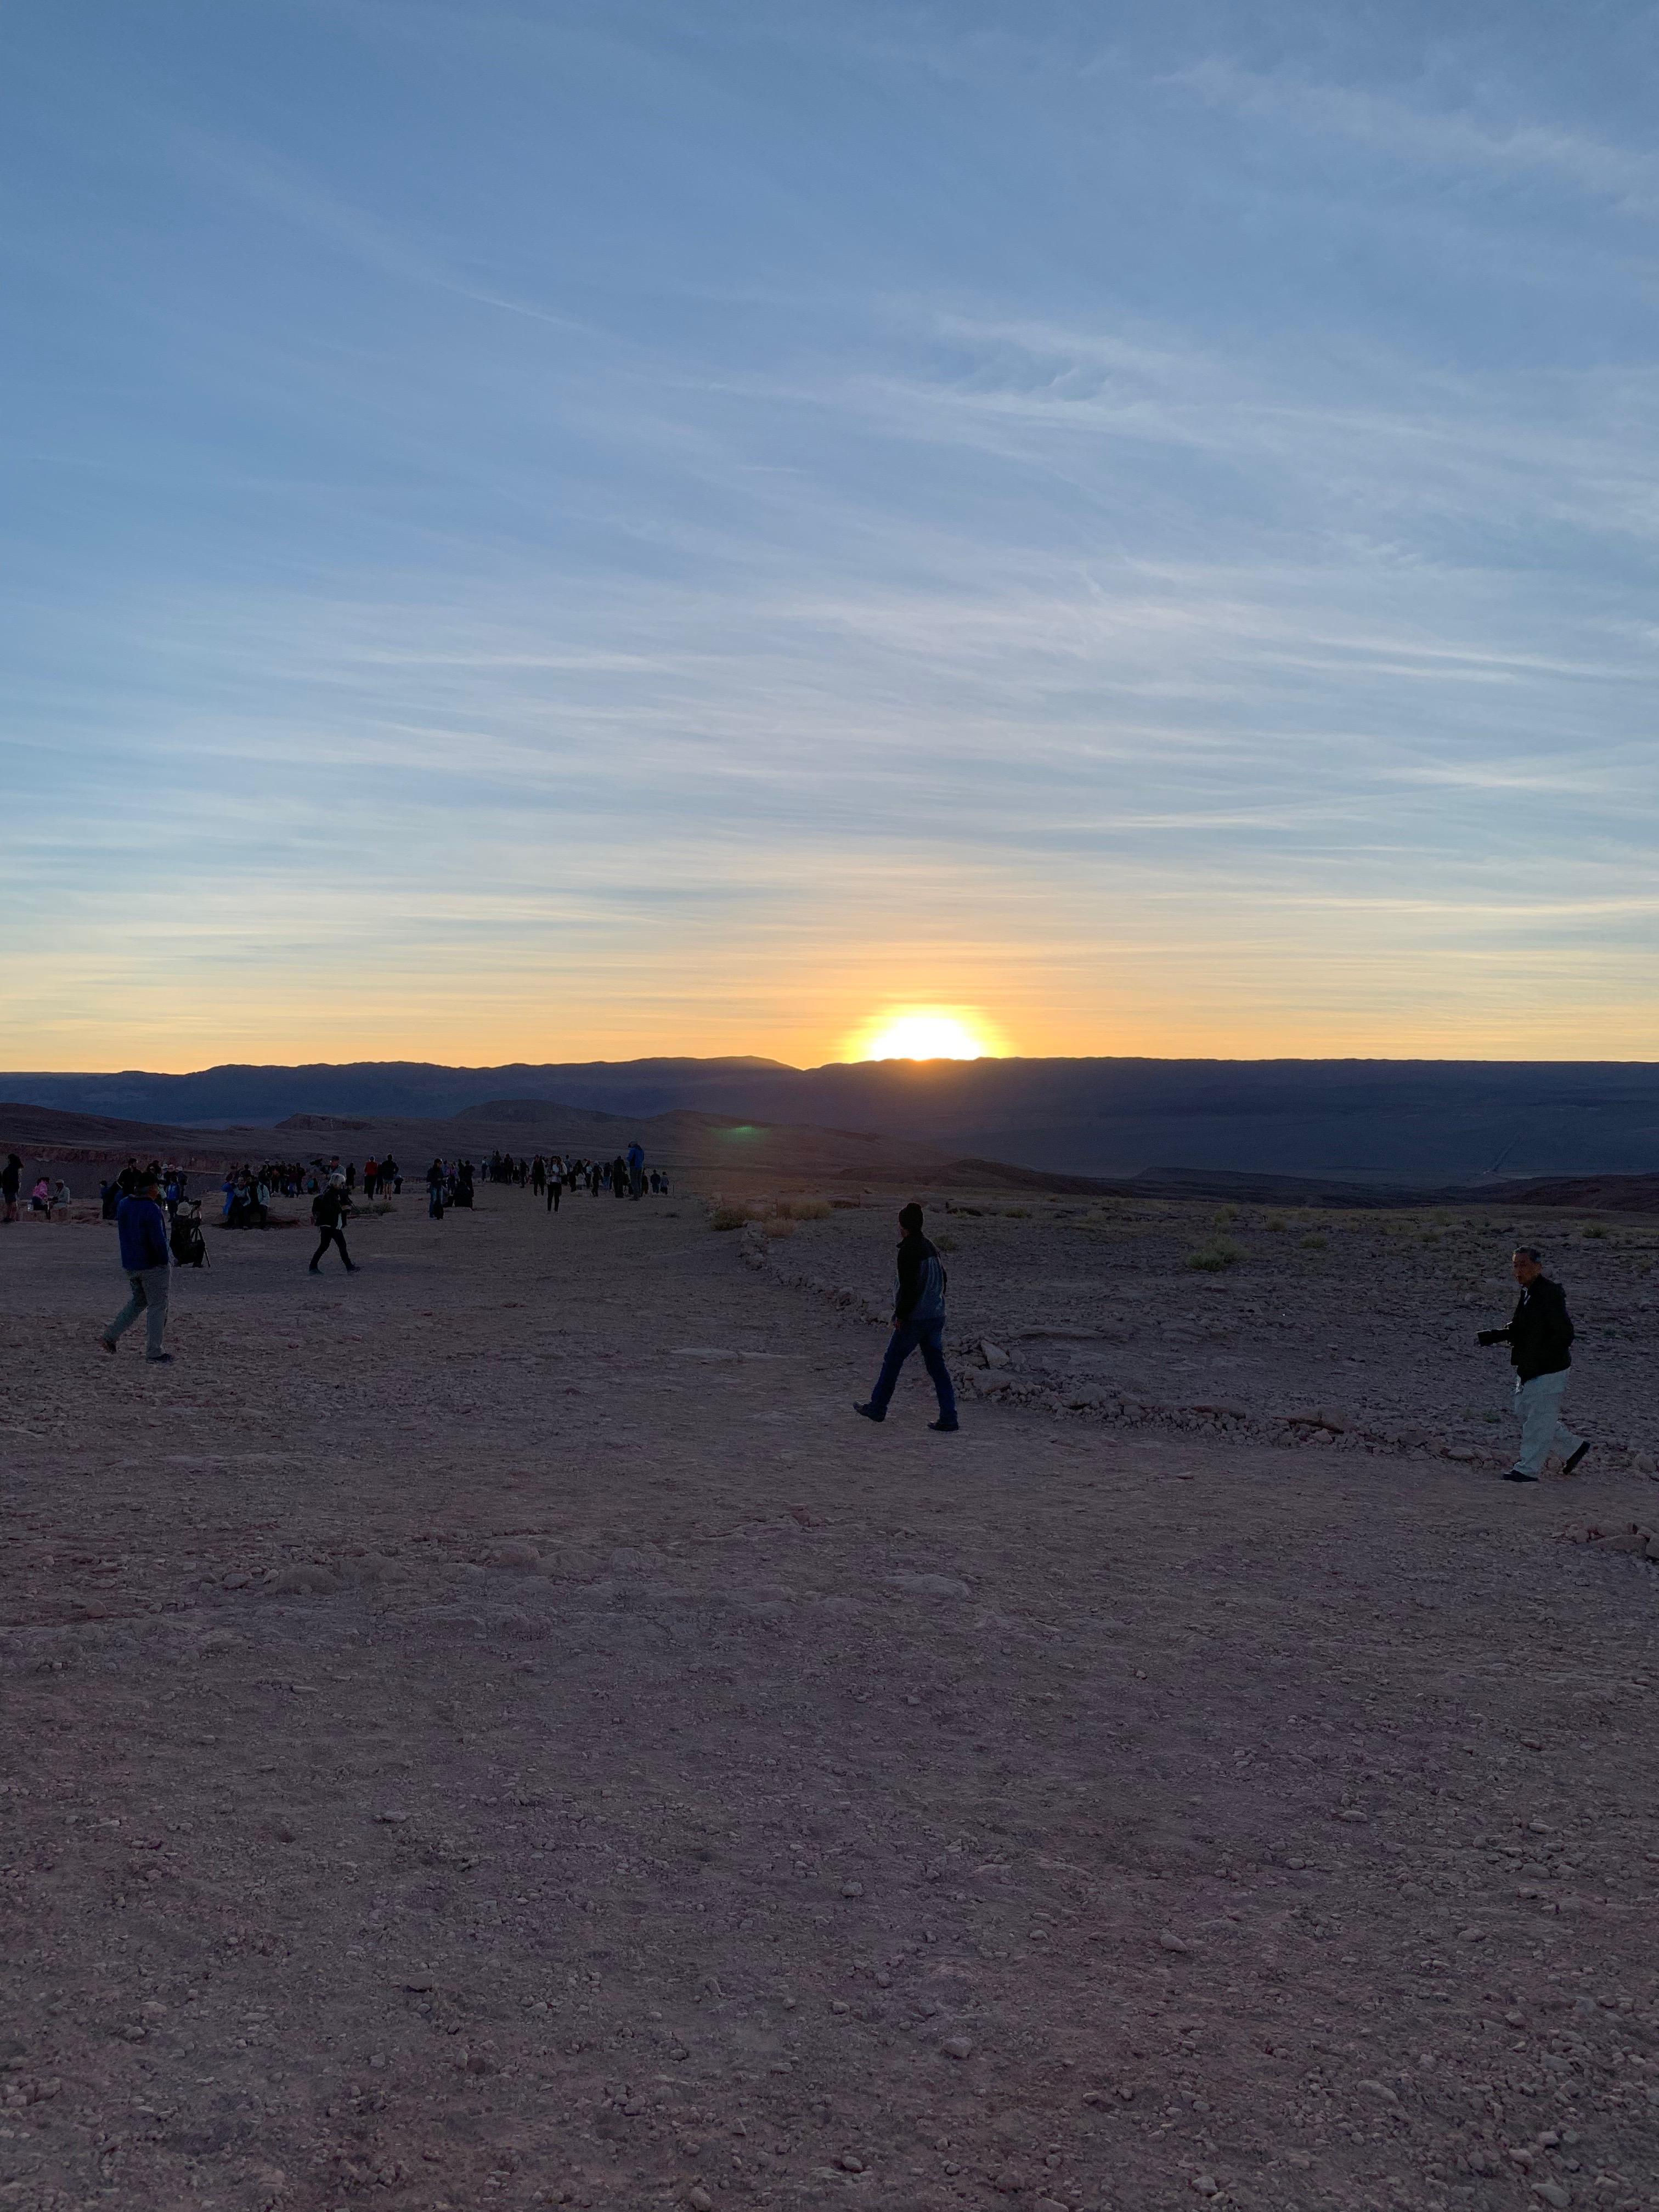 http://meineko.sakura.ne.jp/Chile/Chile-5-Atacama.JPG